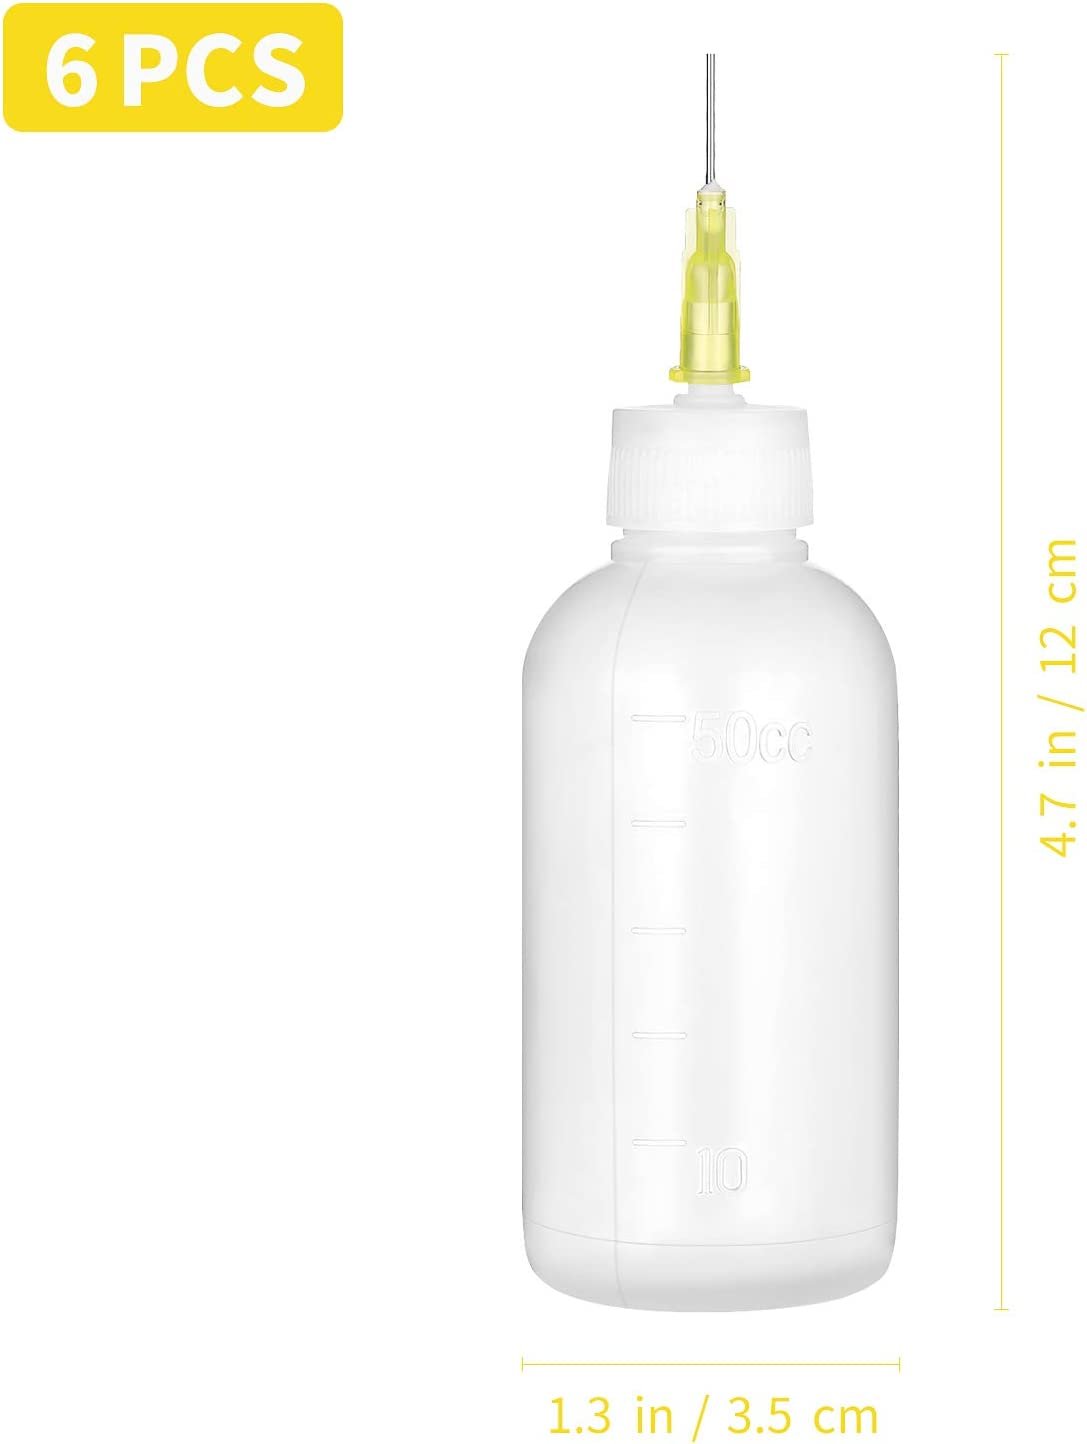 /Öler Flasche Artibetter Pr/äzisionskleber Applikator Flasche Ultra feine Nadelspitze Kleber Applikator Squeeze Flaschen f/ür DIY Quilling Acrylfarbe Kunst Hobby